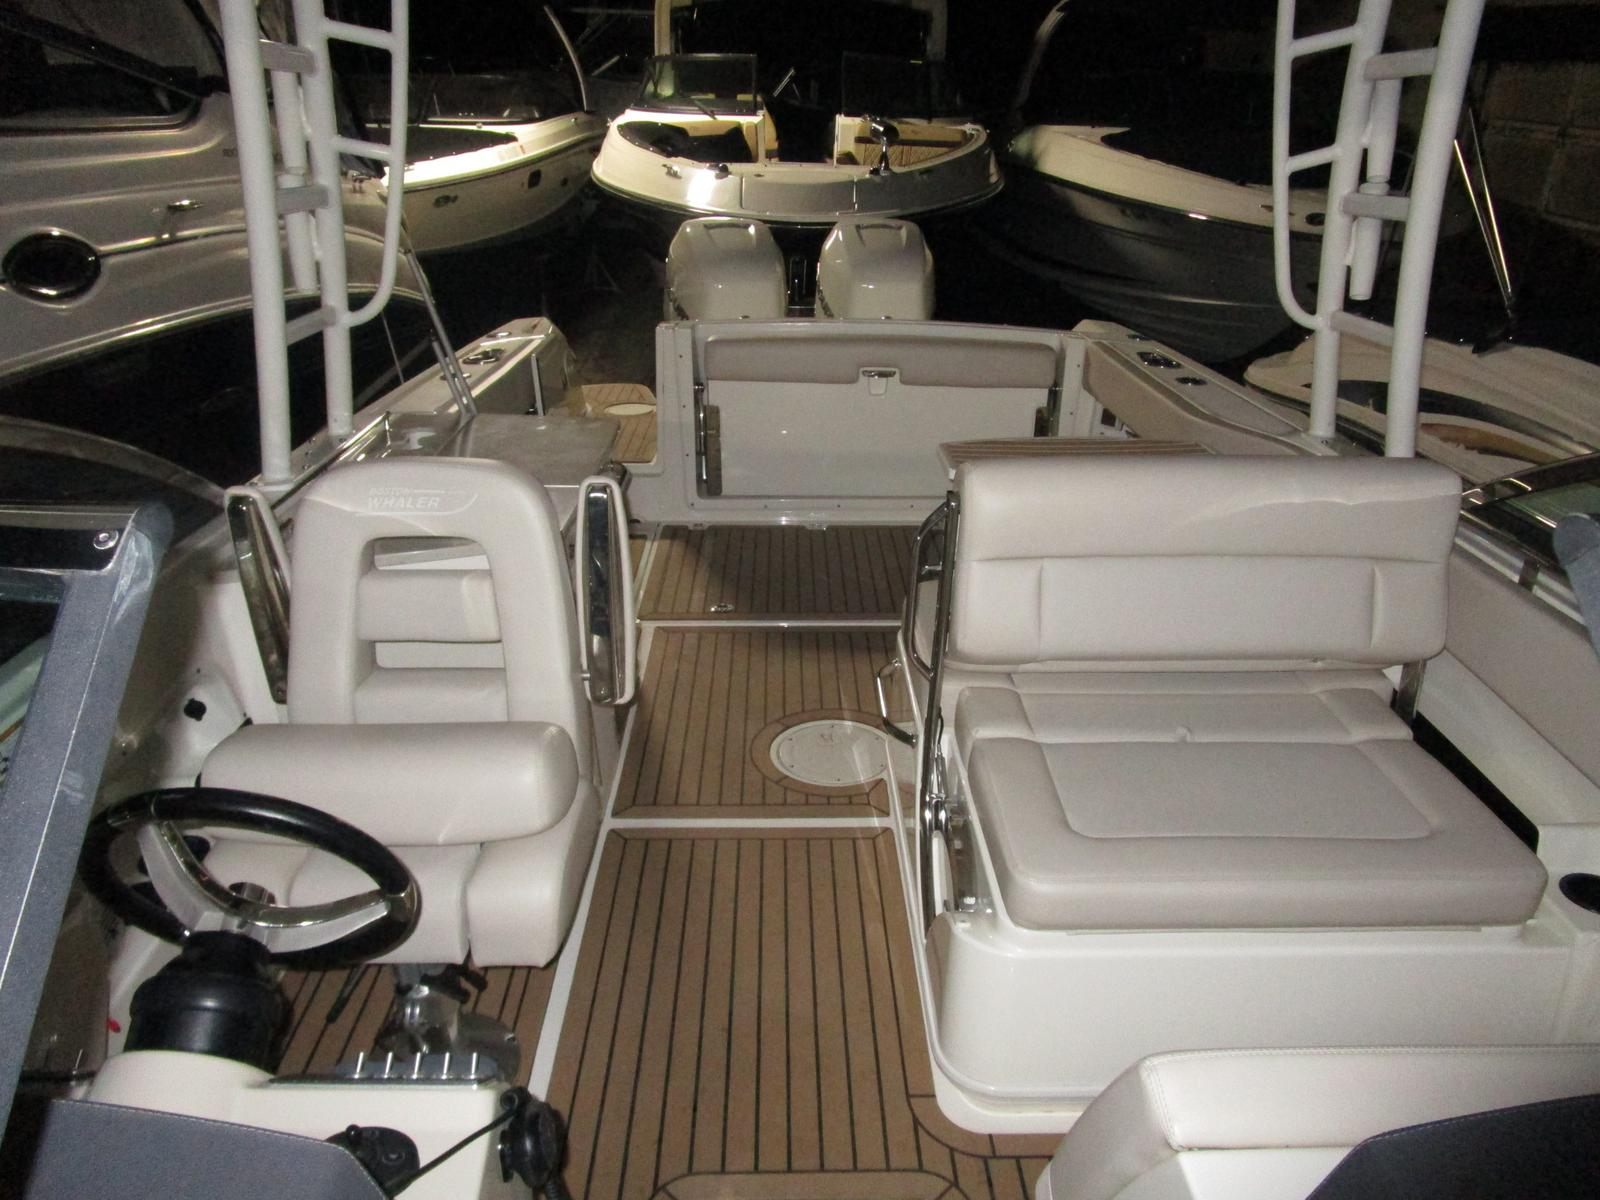 2017 Boston Whaler boat for sale, model of the boat is 270 Vantage Freshwater, Joystick, Loaded!!! & Image # 11 of 14